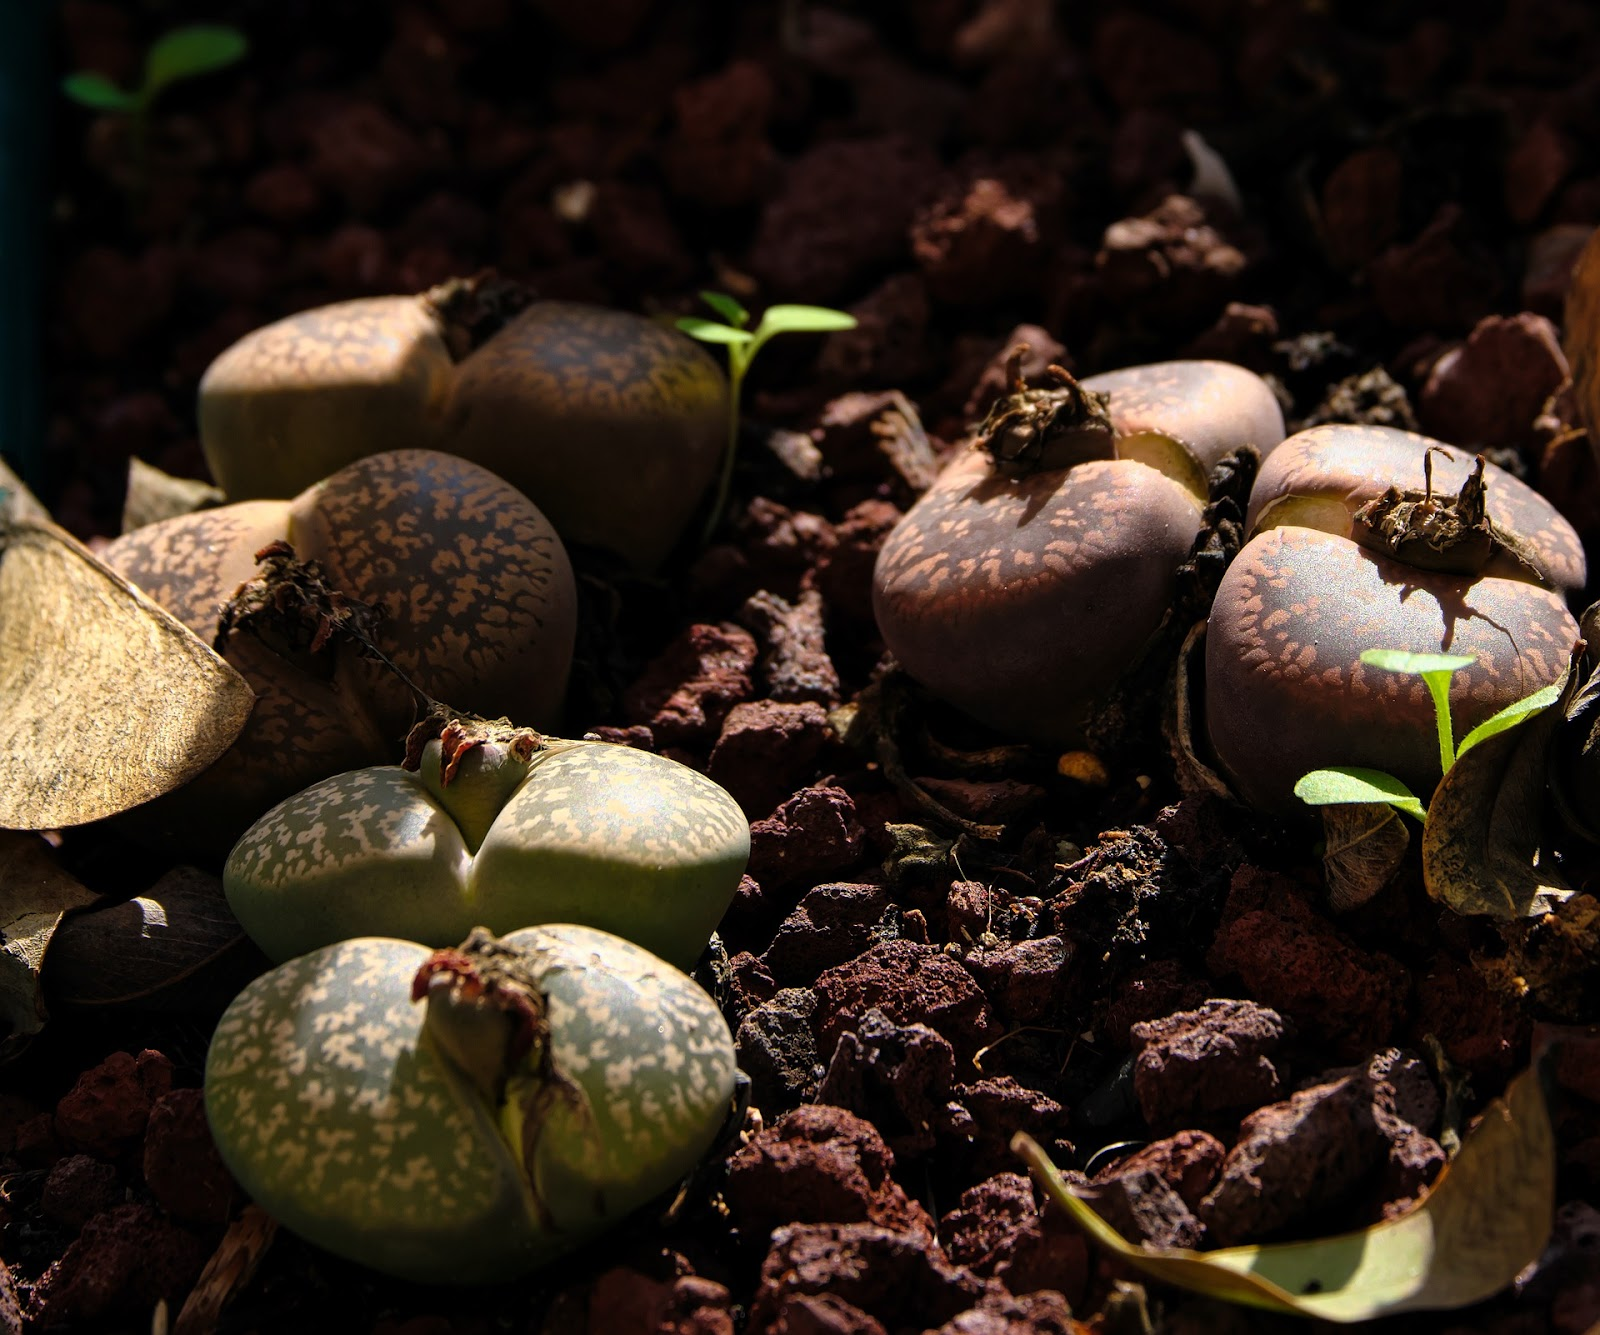 Living stones lithops